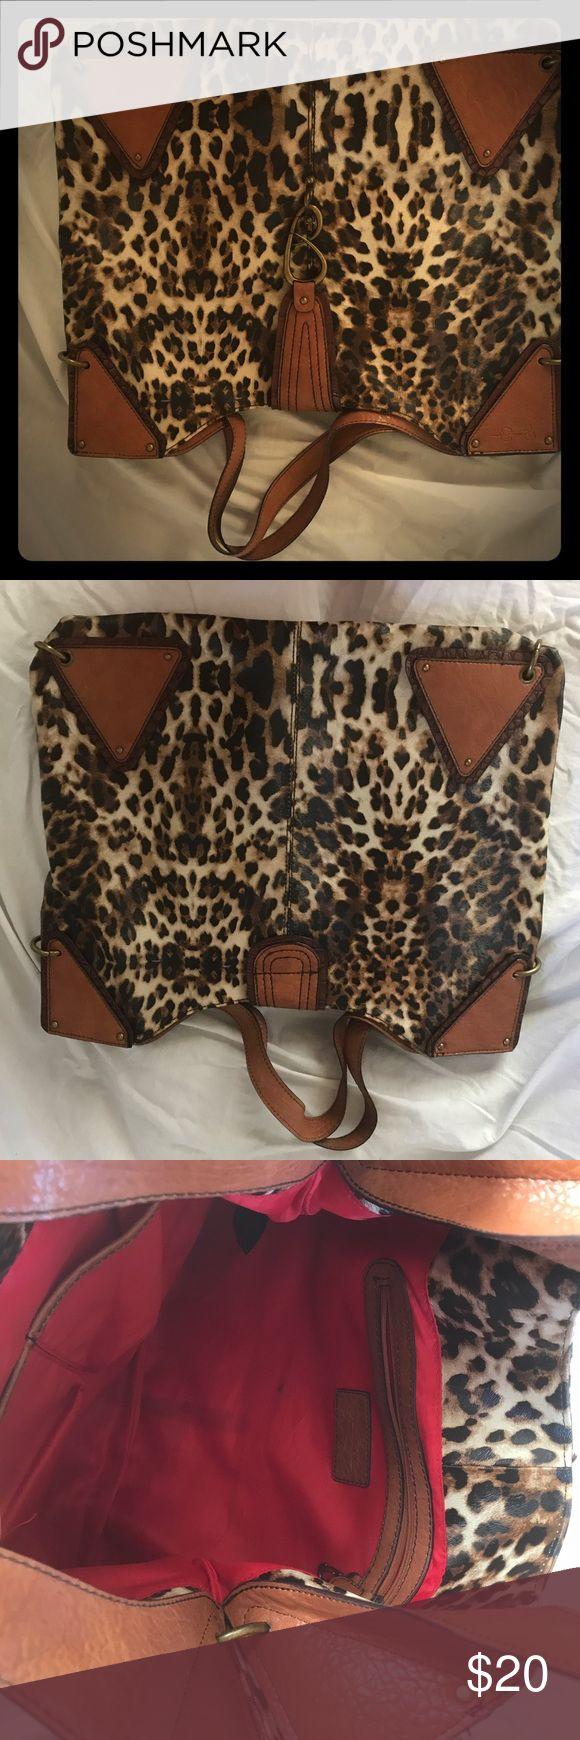 Jessica Simpson Handbag Jessica Simpson Leather Leopard Handbag W 18 x H 14 Jessica Simpson Bags Shoulder Bags